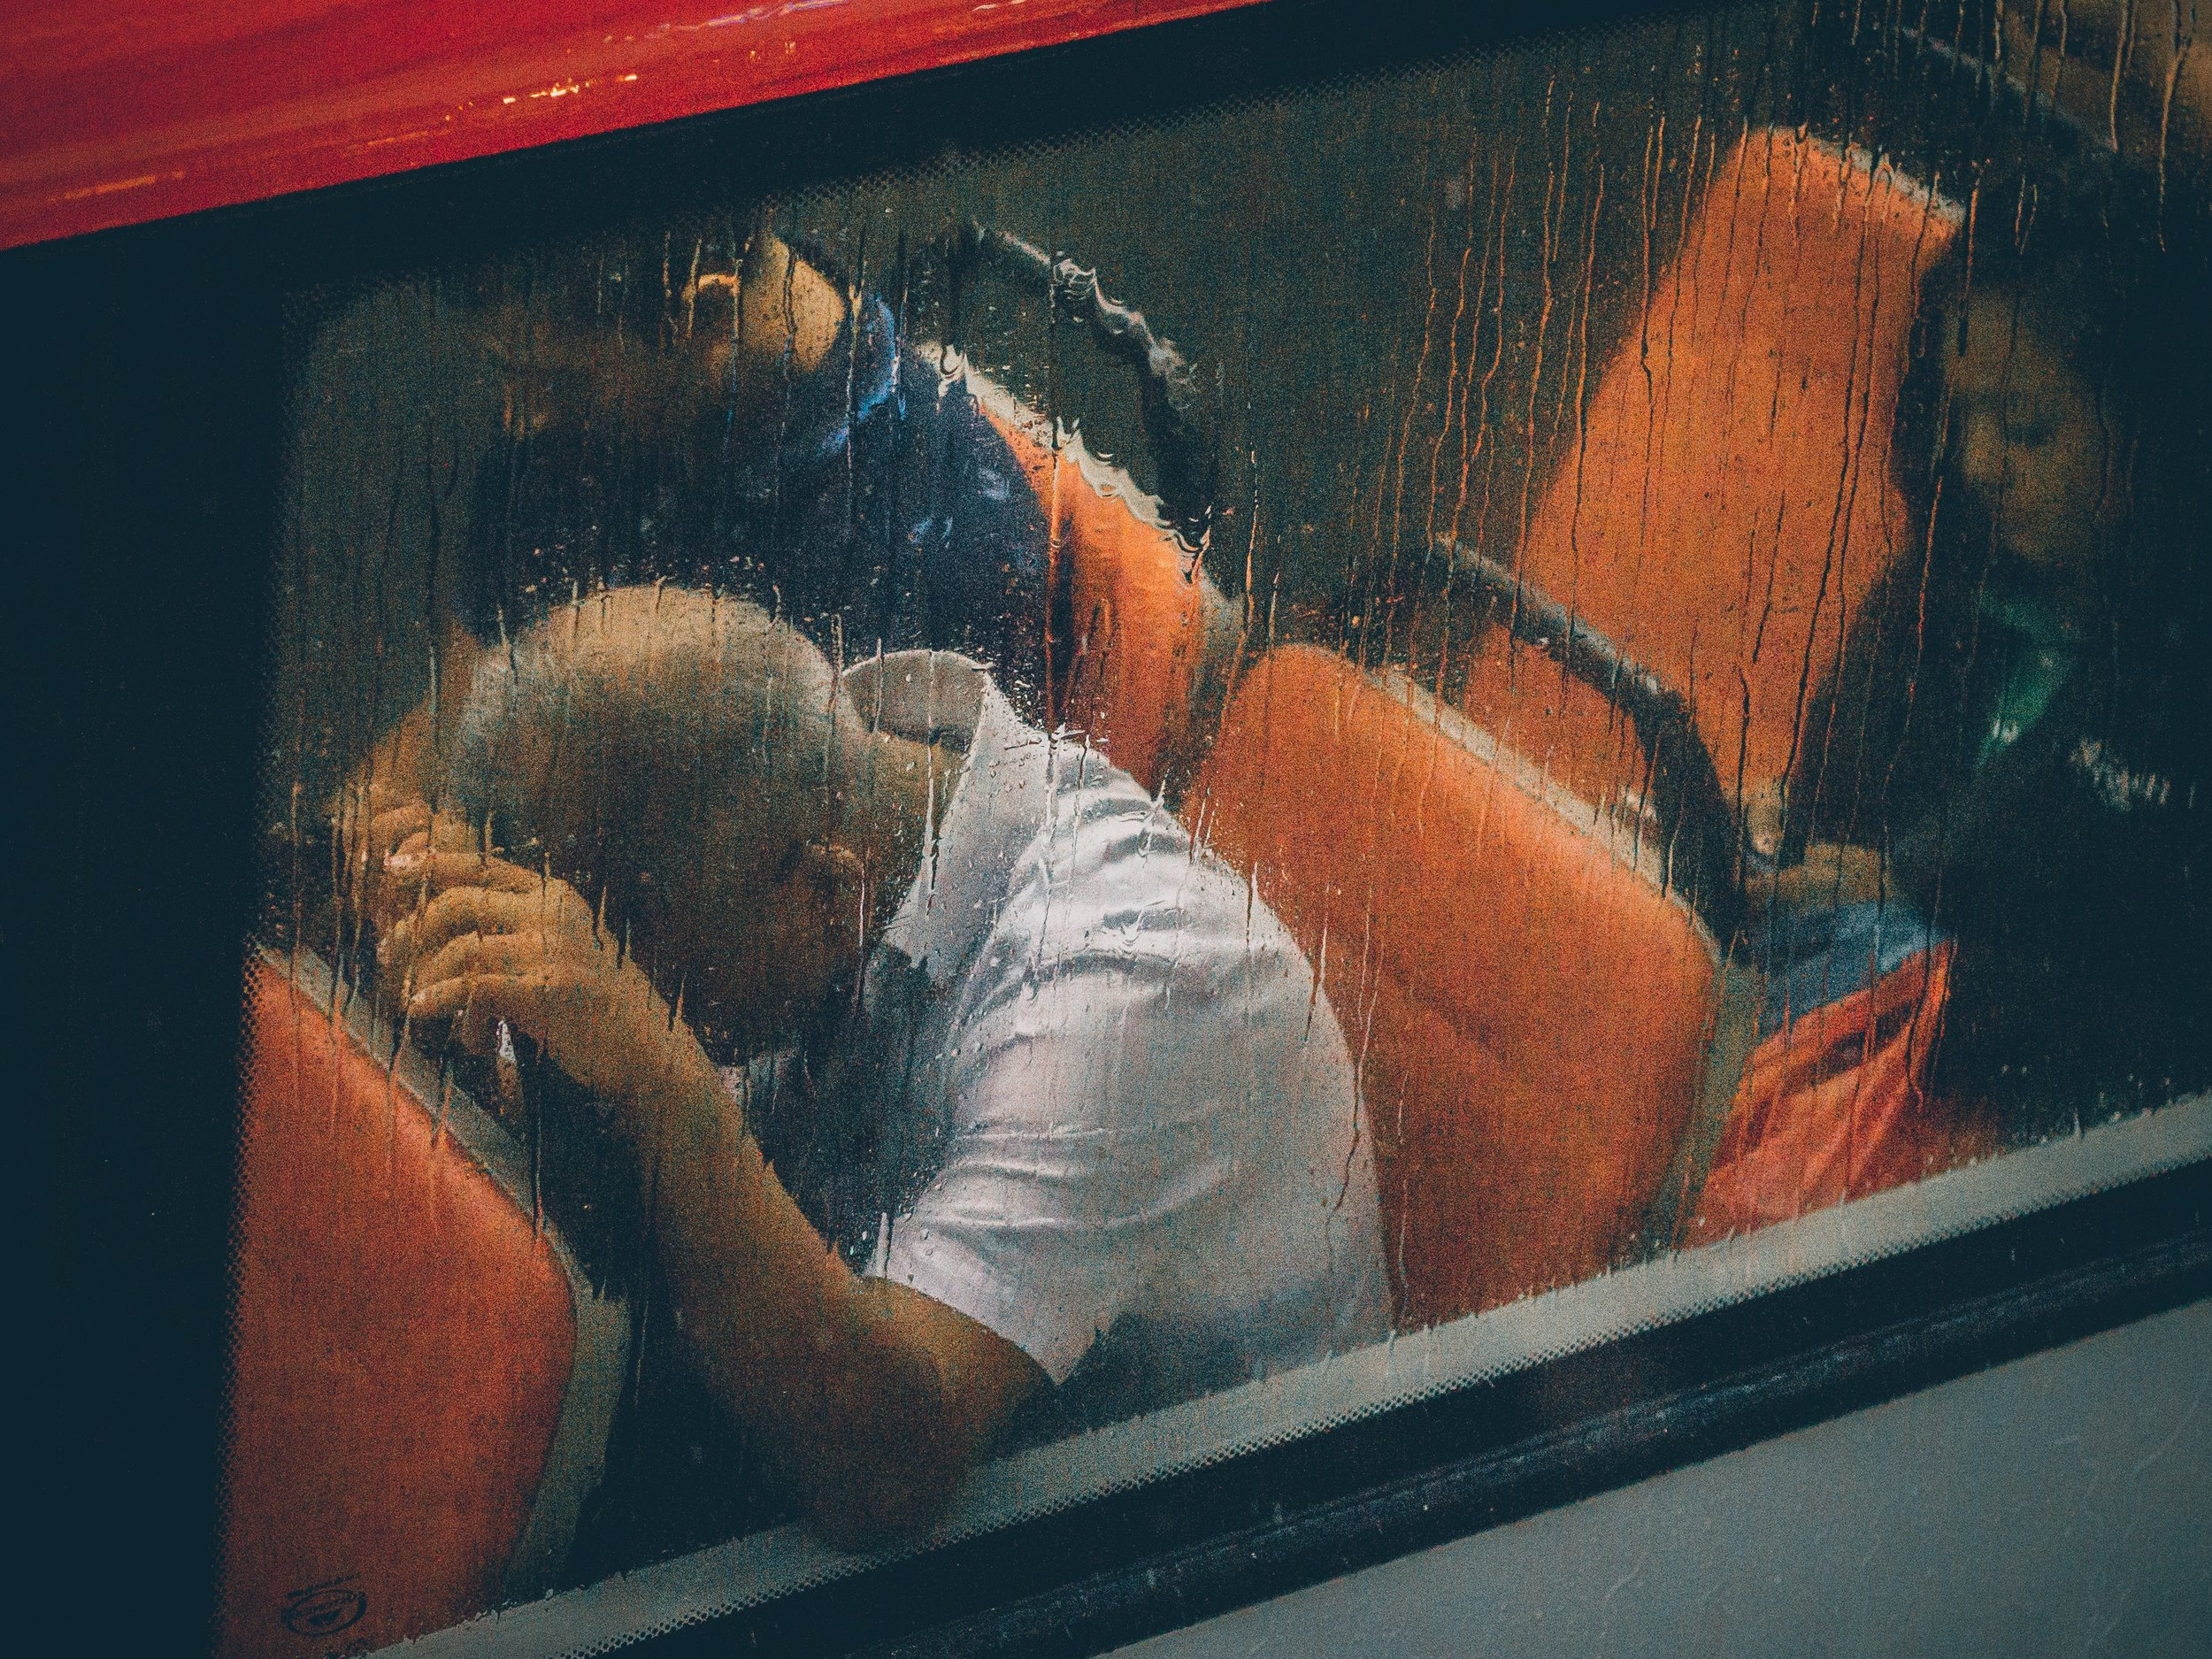 Me all day on the horrible, terrible trains (#k1enksvsthemta)